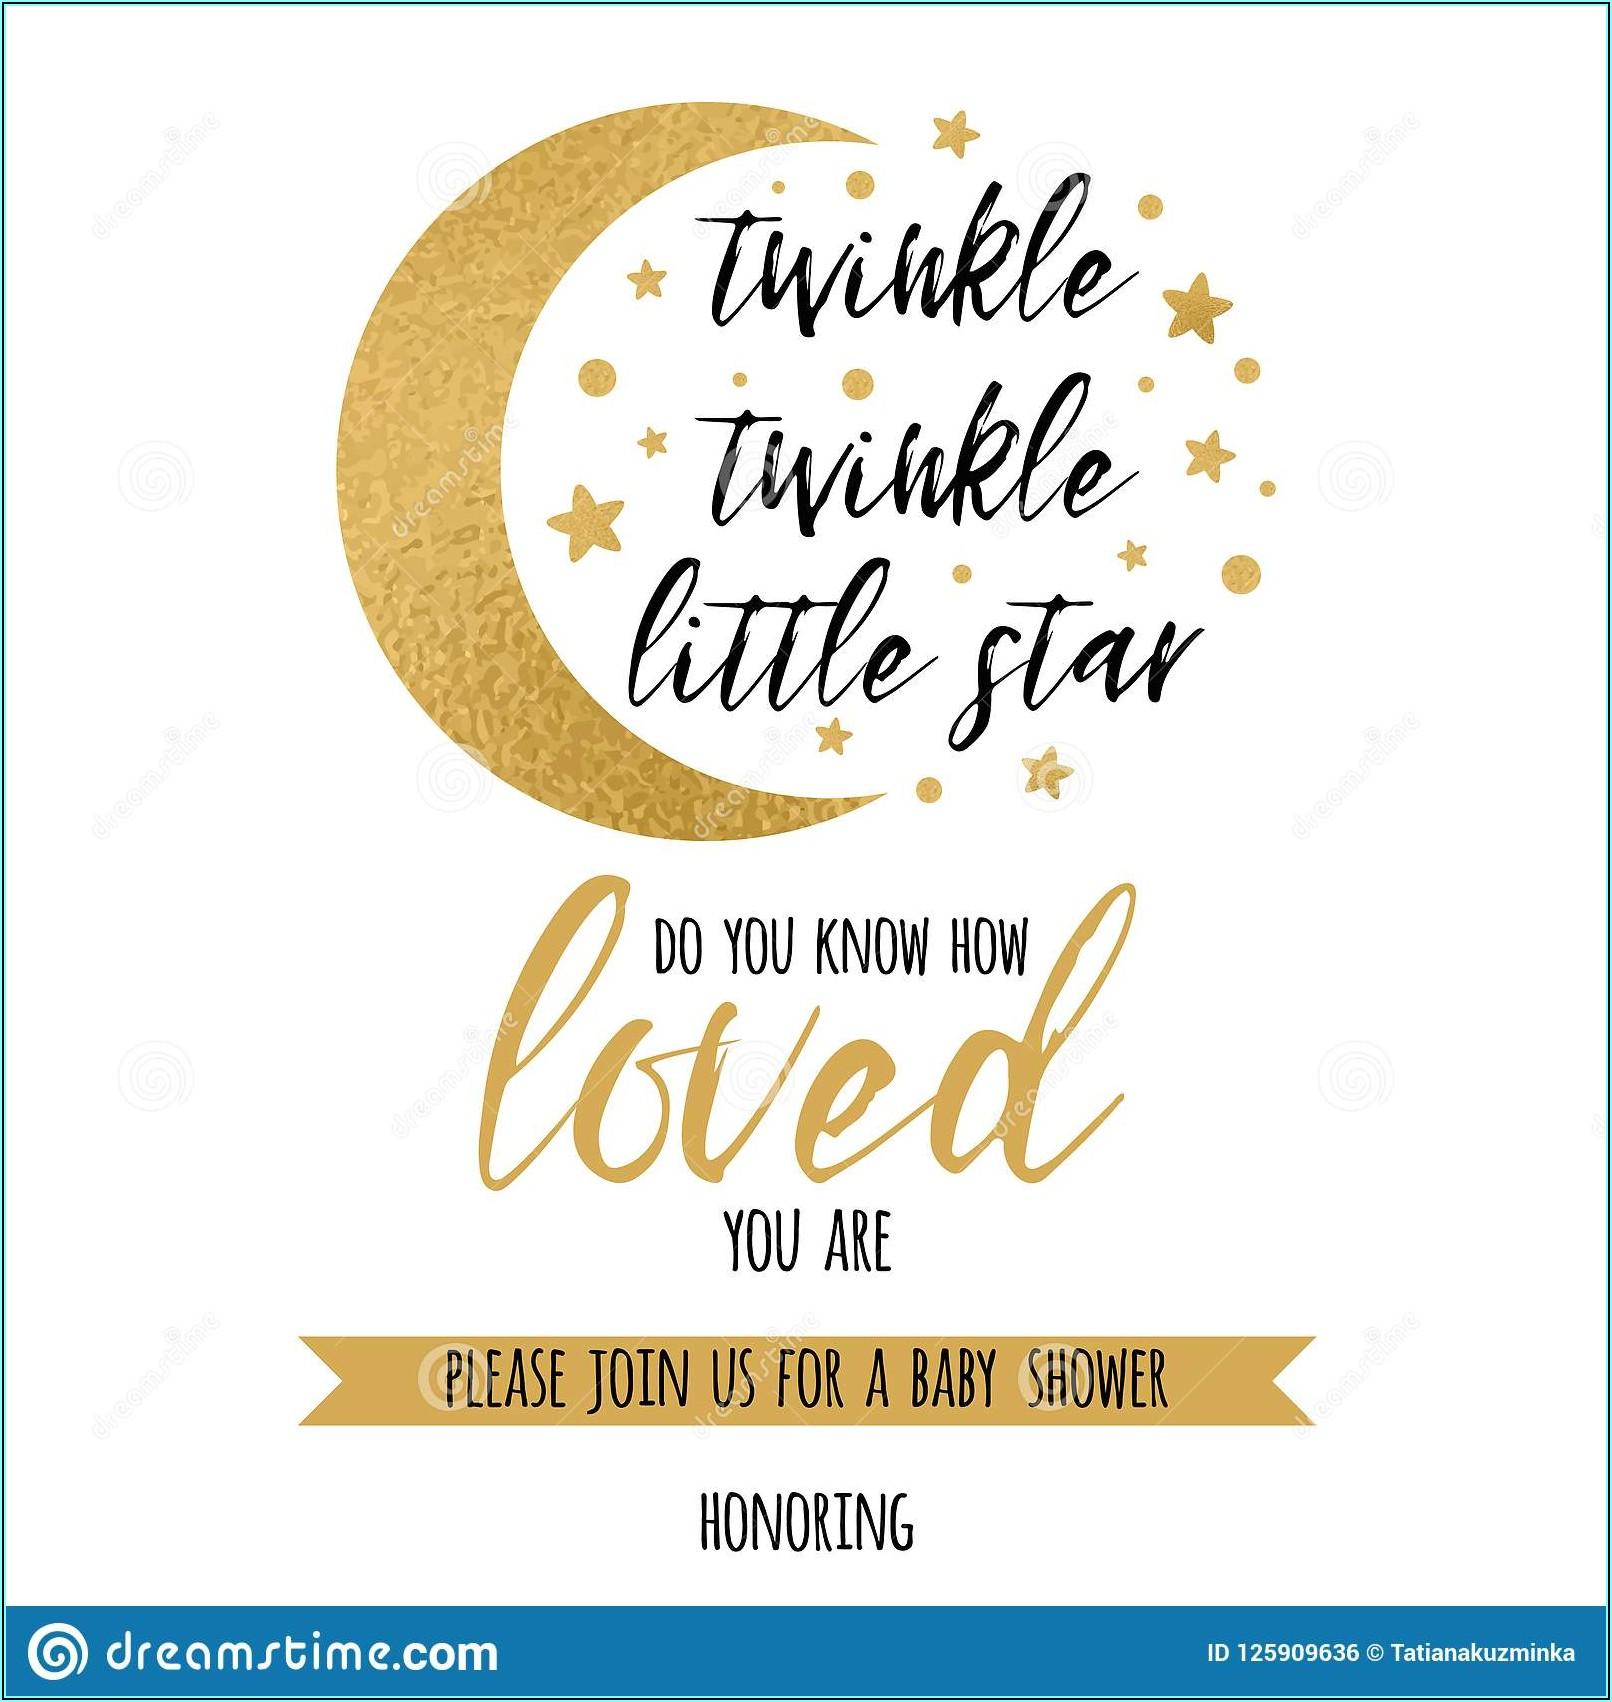 Twinkle Twinkle Little Star Gender Reveal Invitations Free Template